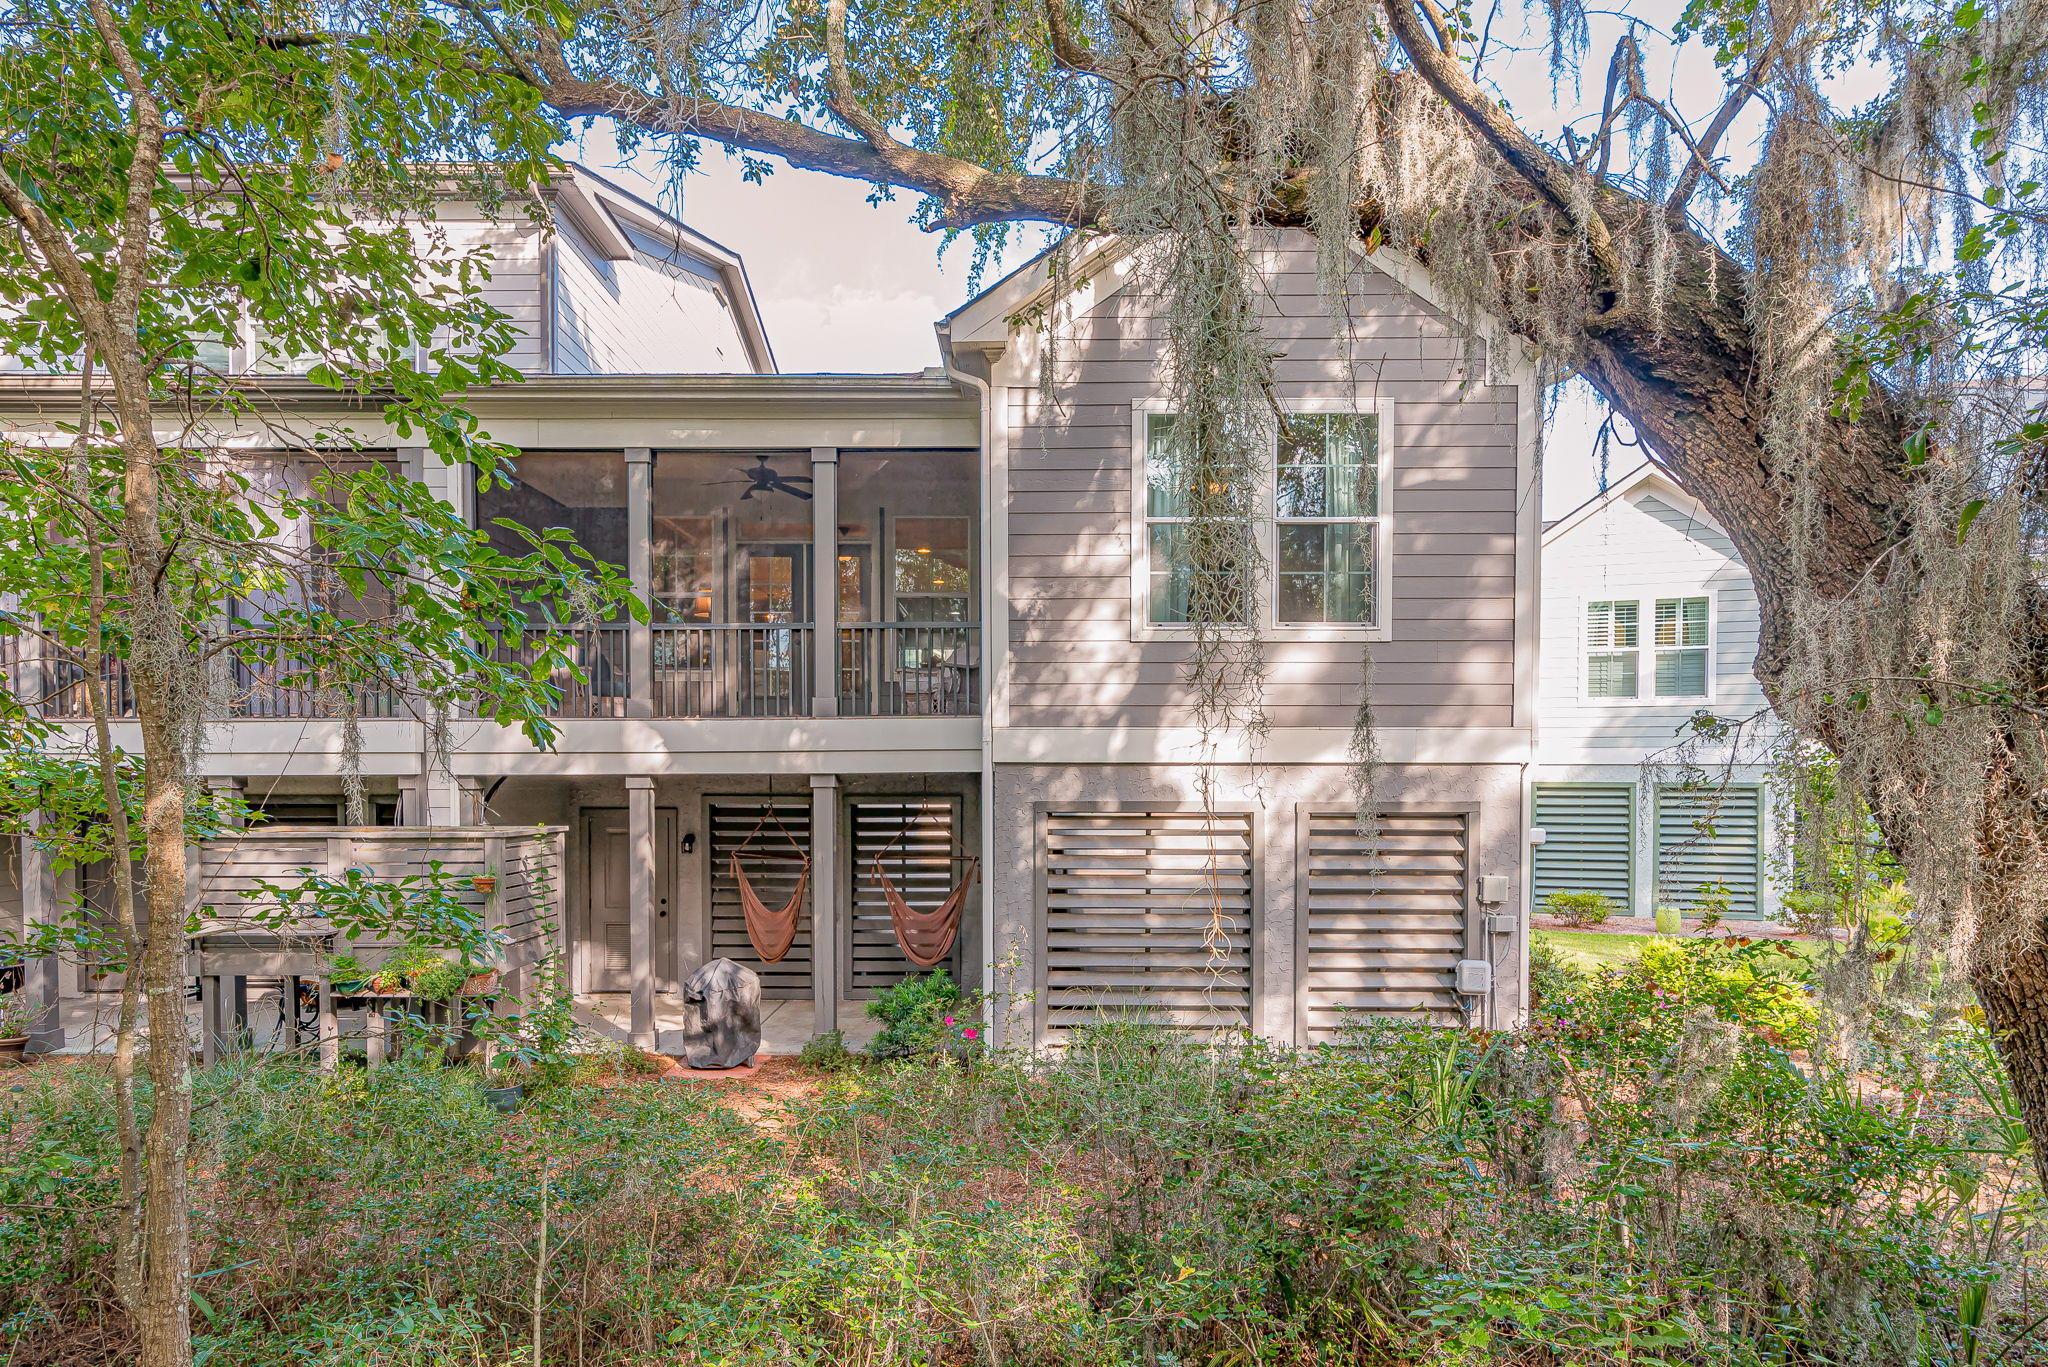 Etiwan Pointe Homes For Sale - 159 Slipper Shell, Mount Pleasant, SC - 20